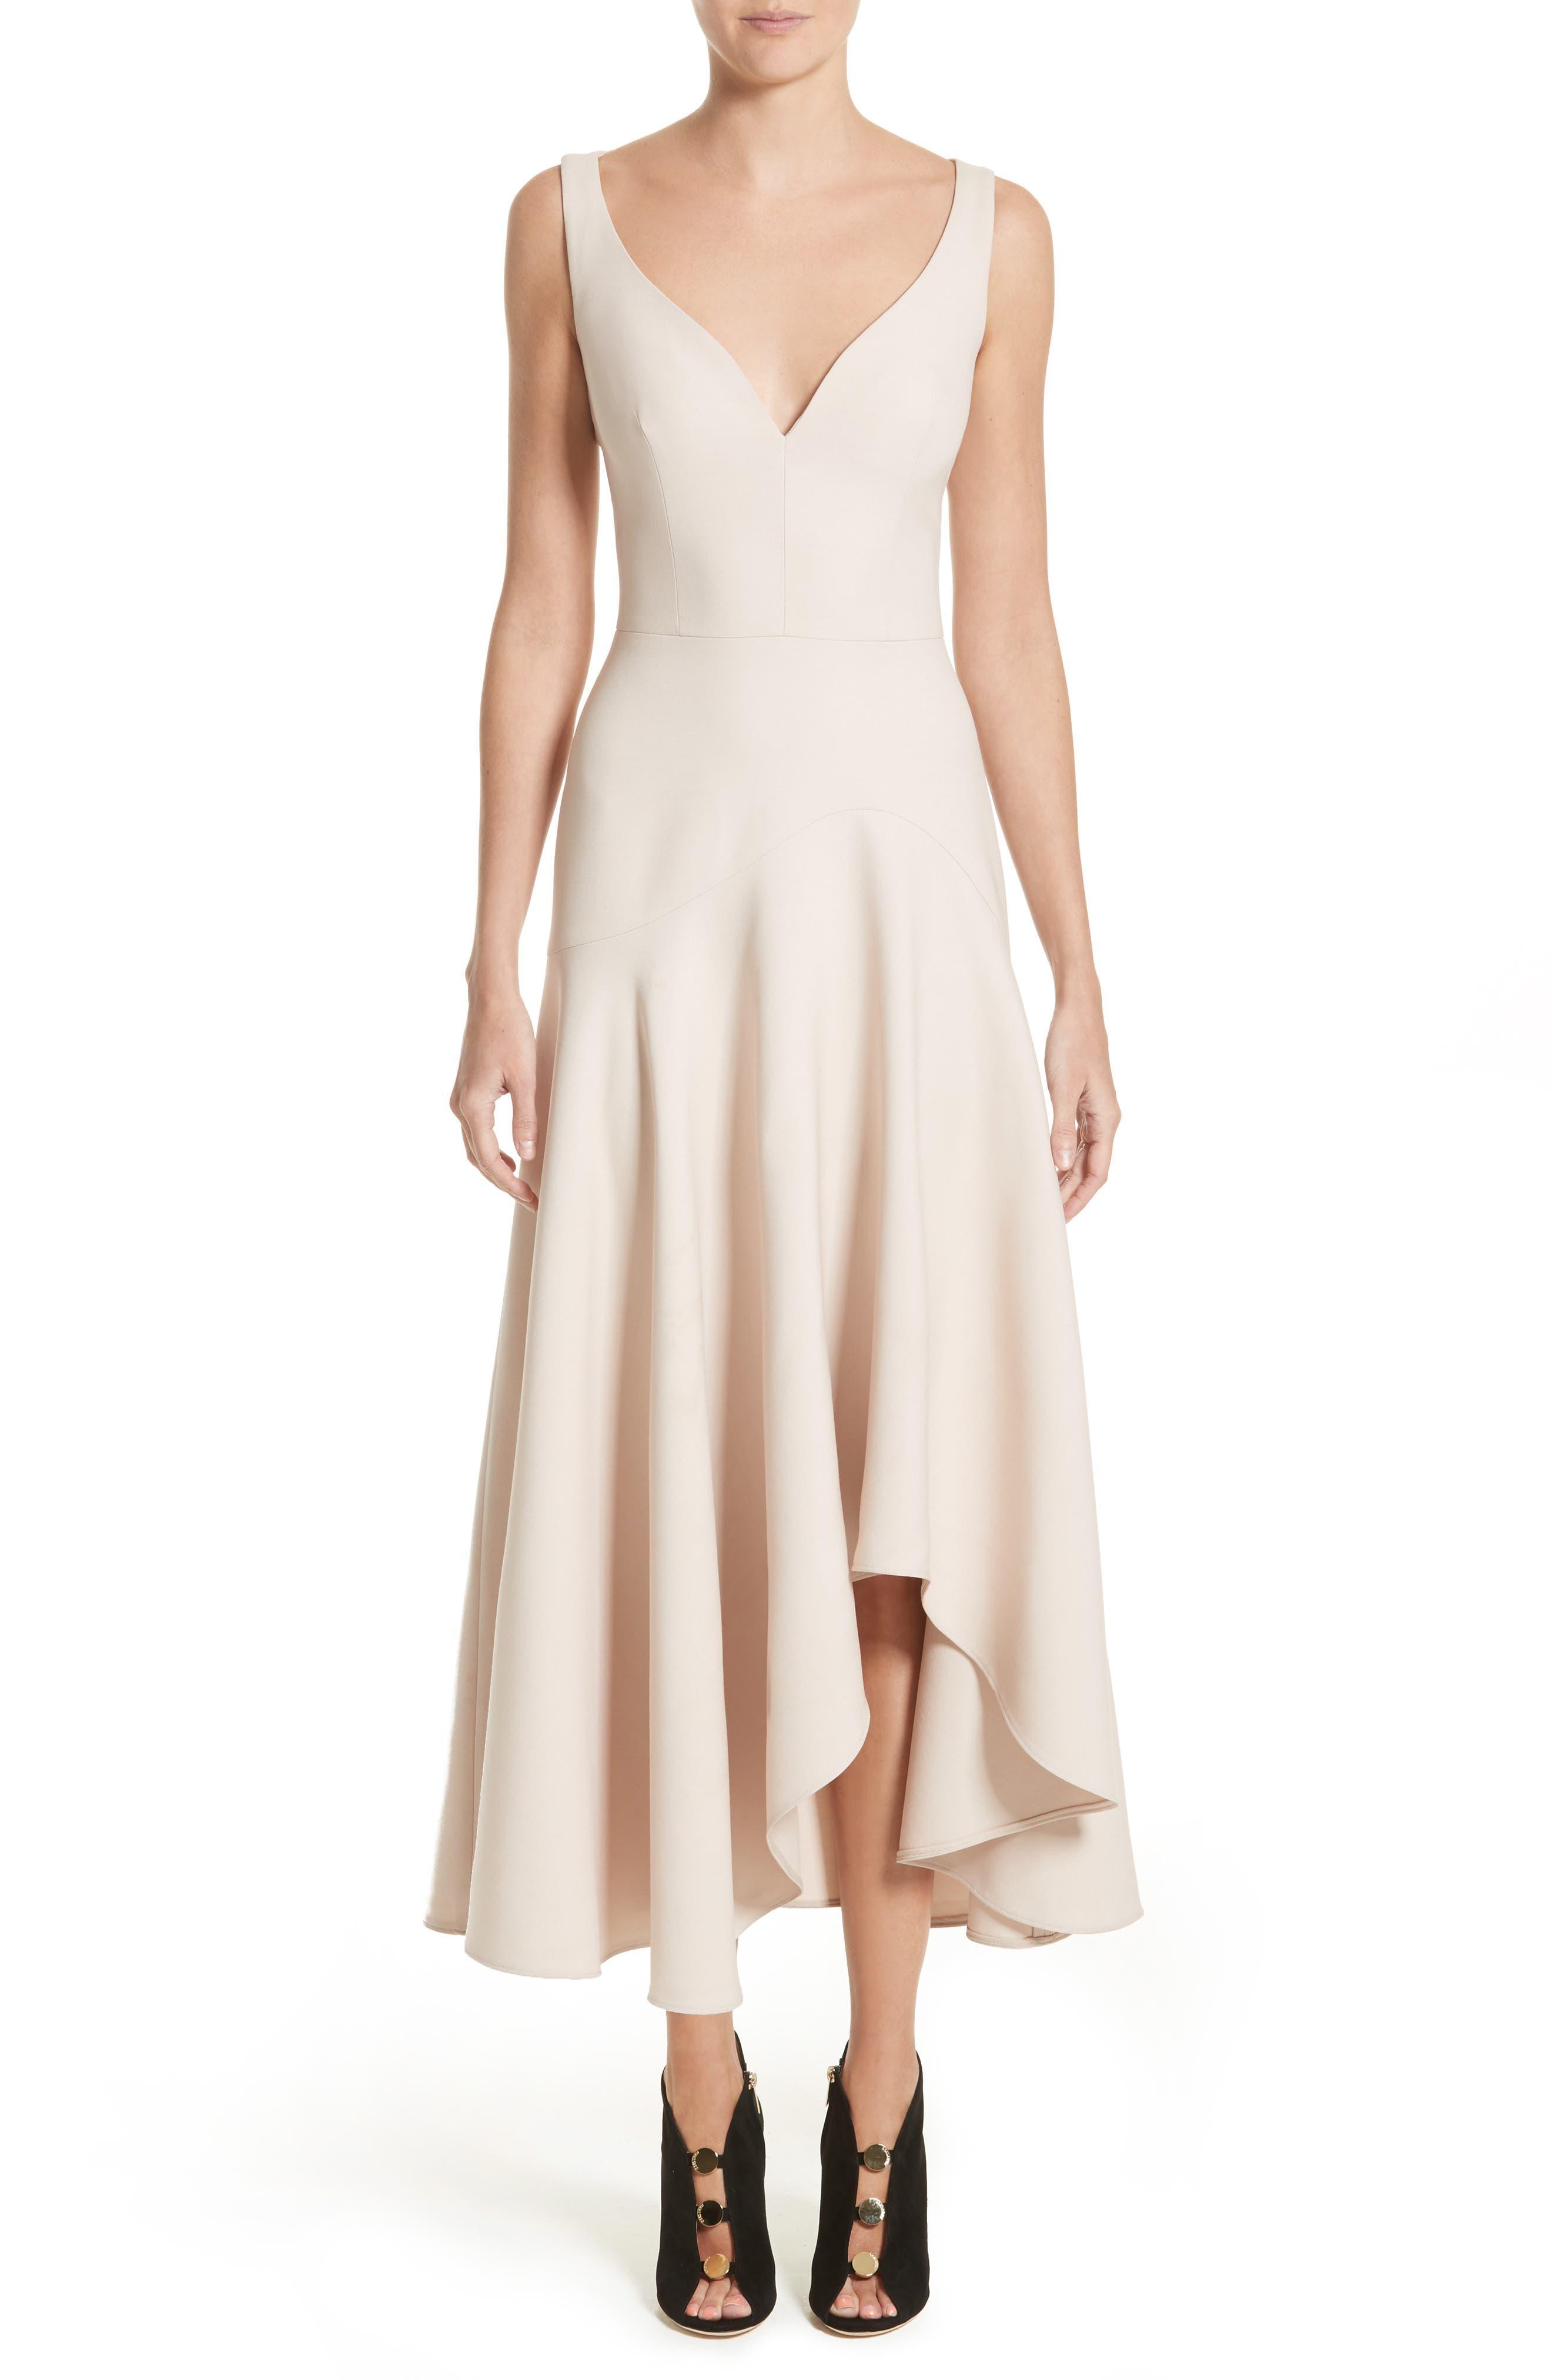 Alternate Image 1 Selected - Alexander McQueen Silk Asymmetrical Dress